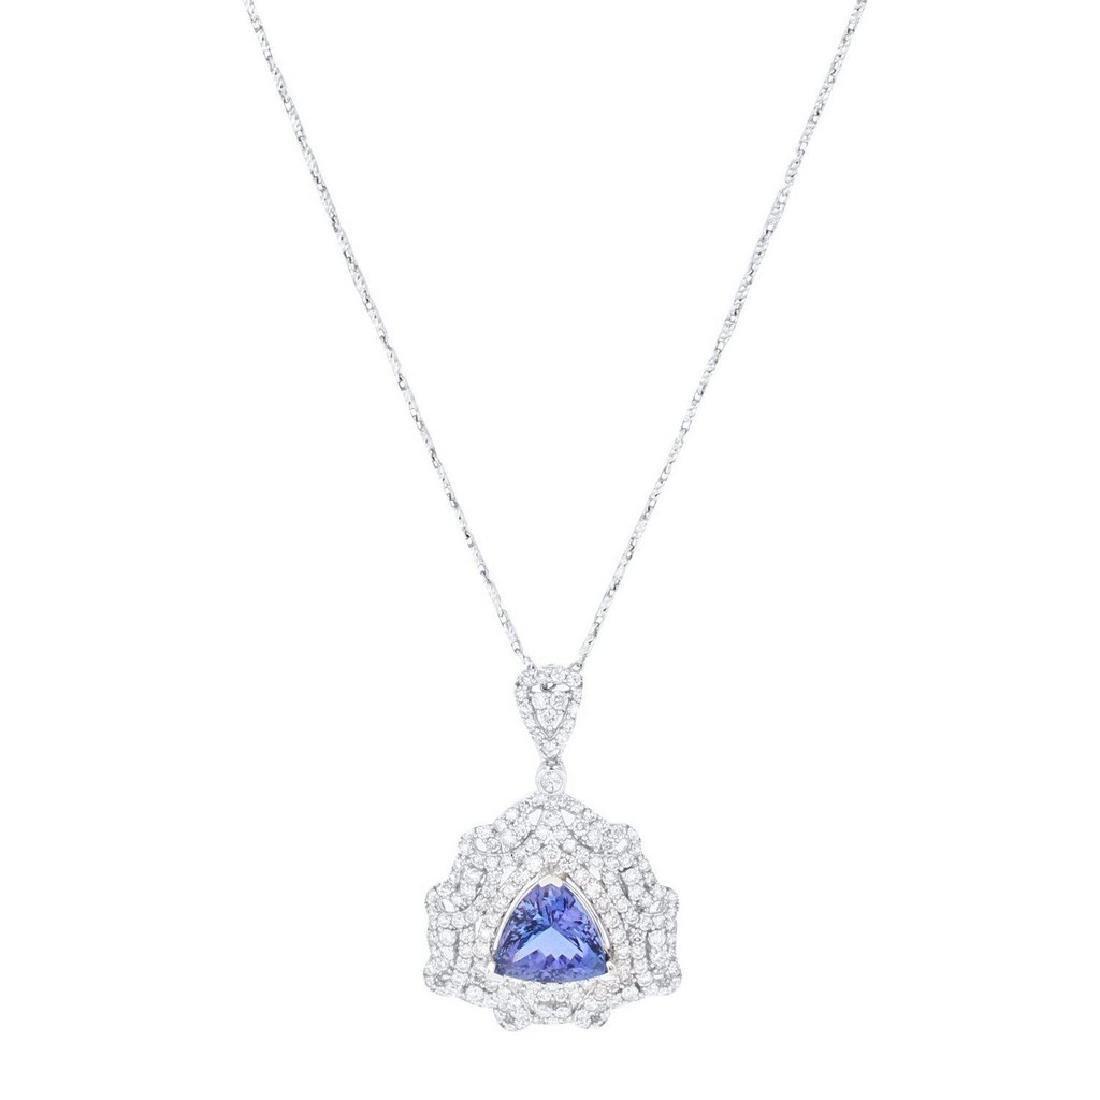 14K White Gold 5.07ct Tanzanite 2.30ct Diamond Necklace